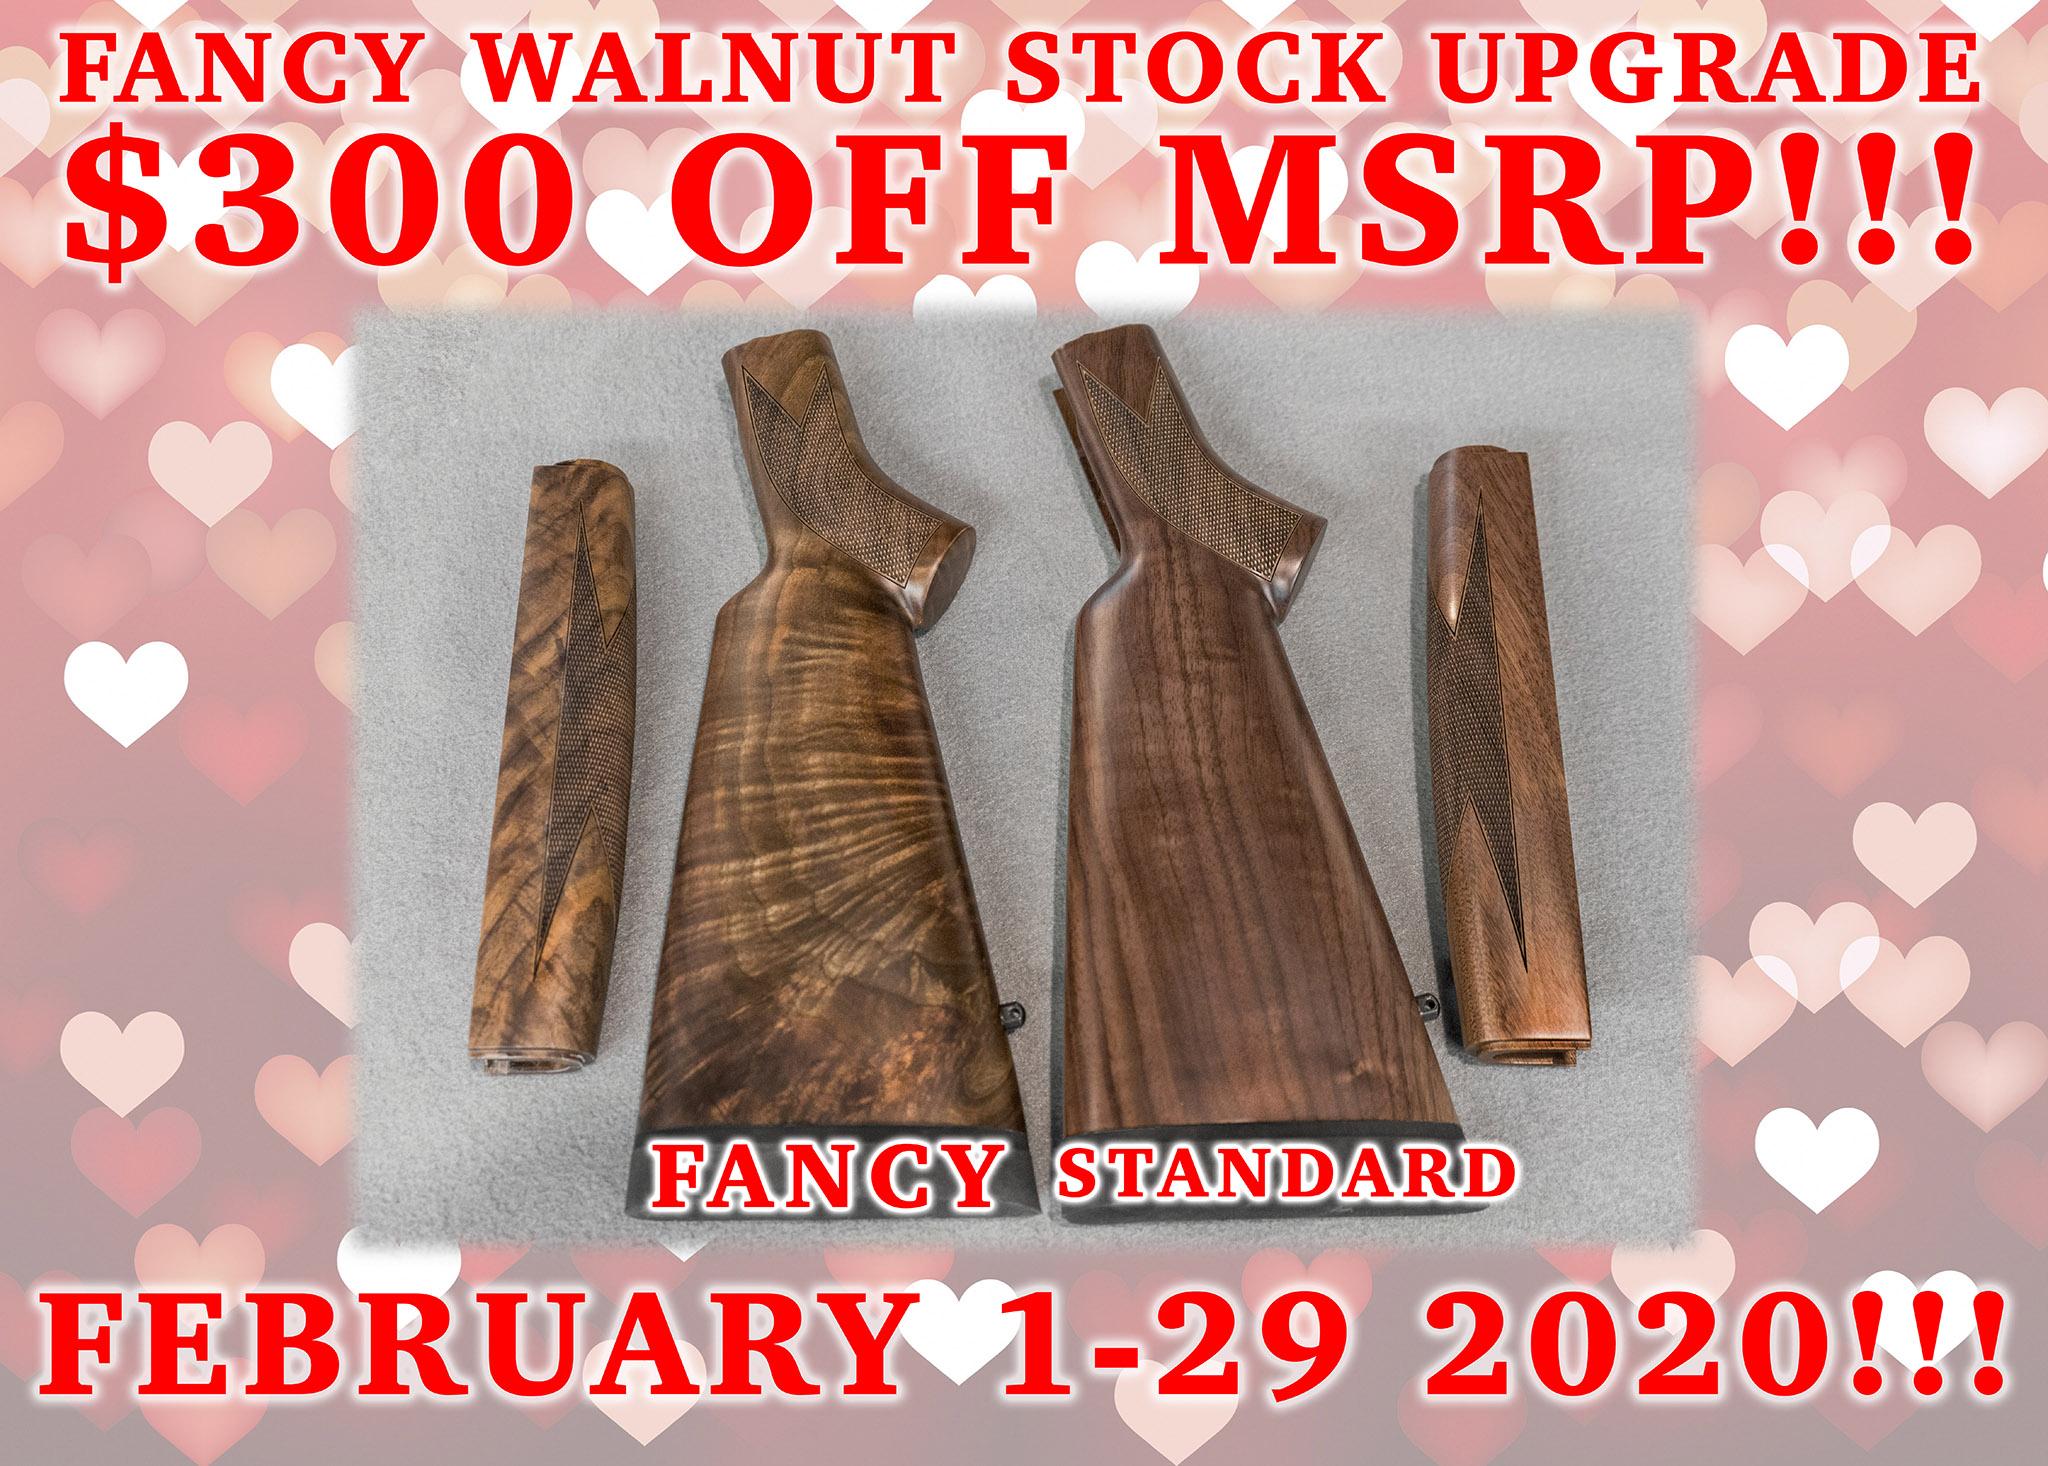 Big Horn Armory Unveils Half Price Special on all Fancy Walnut Stocks